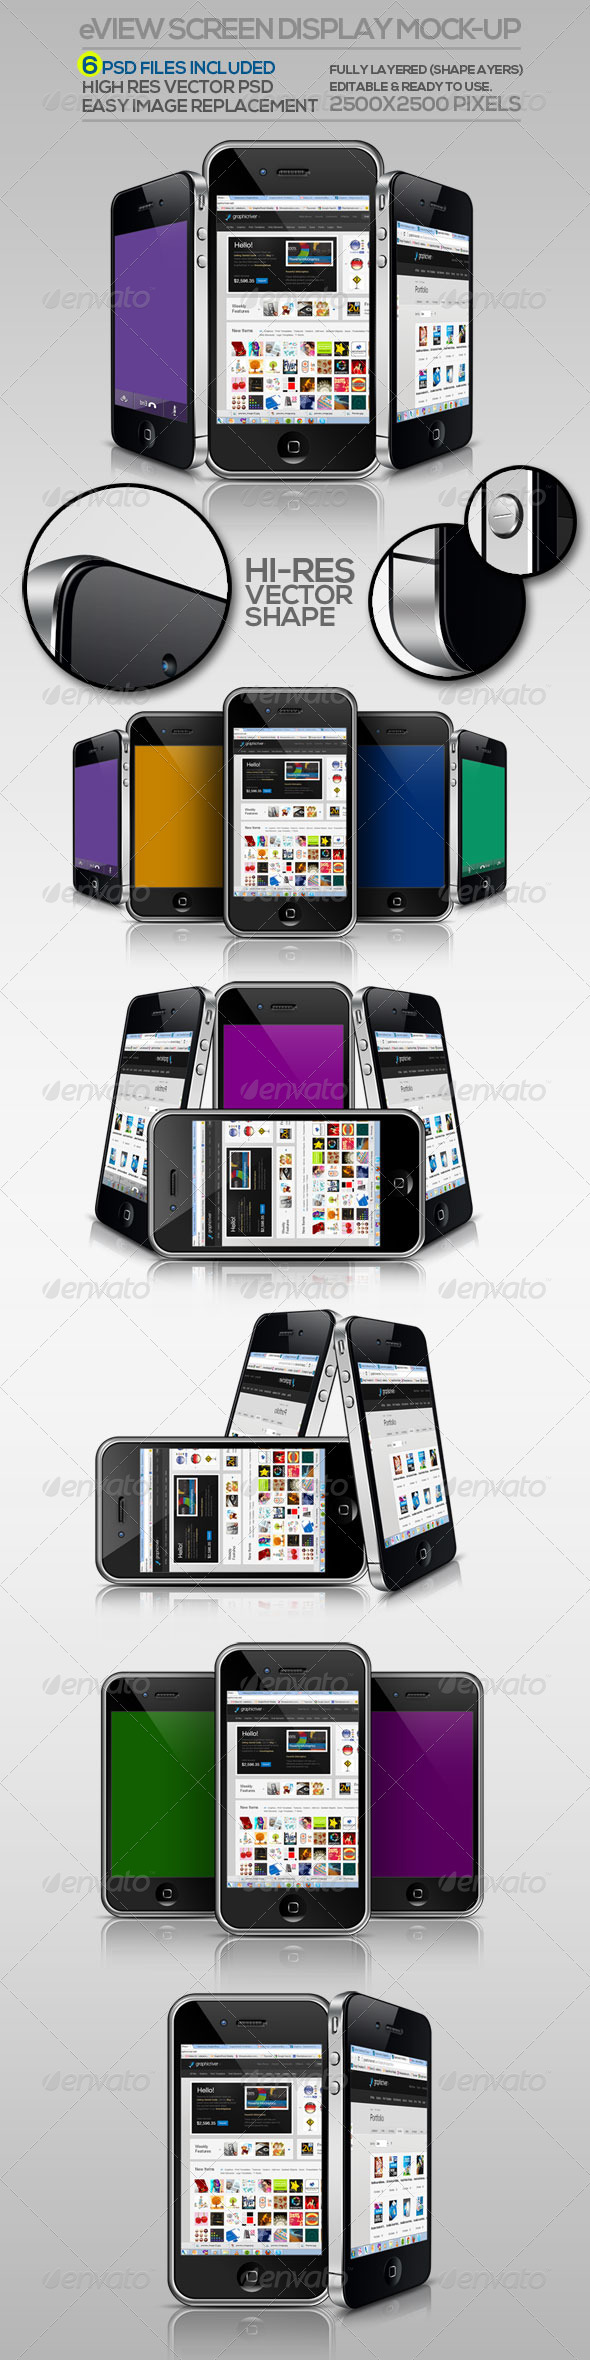 eView Screen Display Mock-up - Mobile Displays